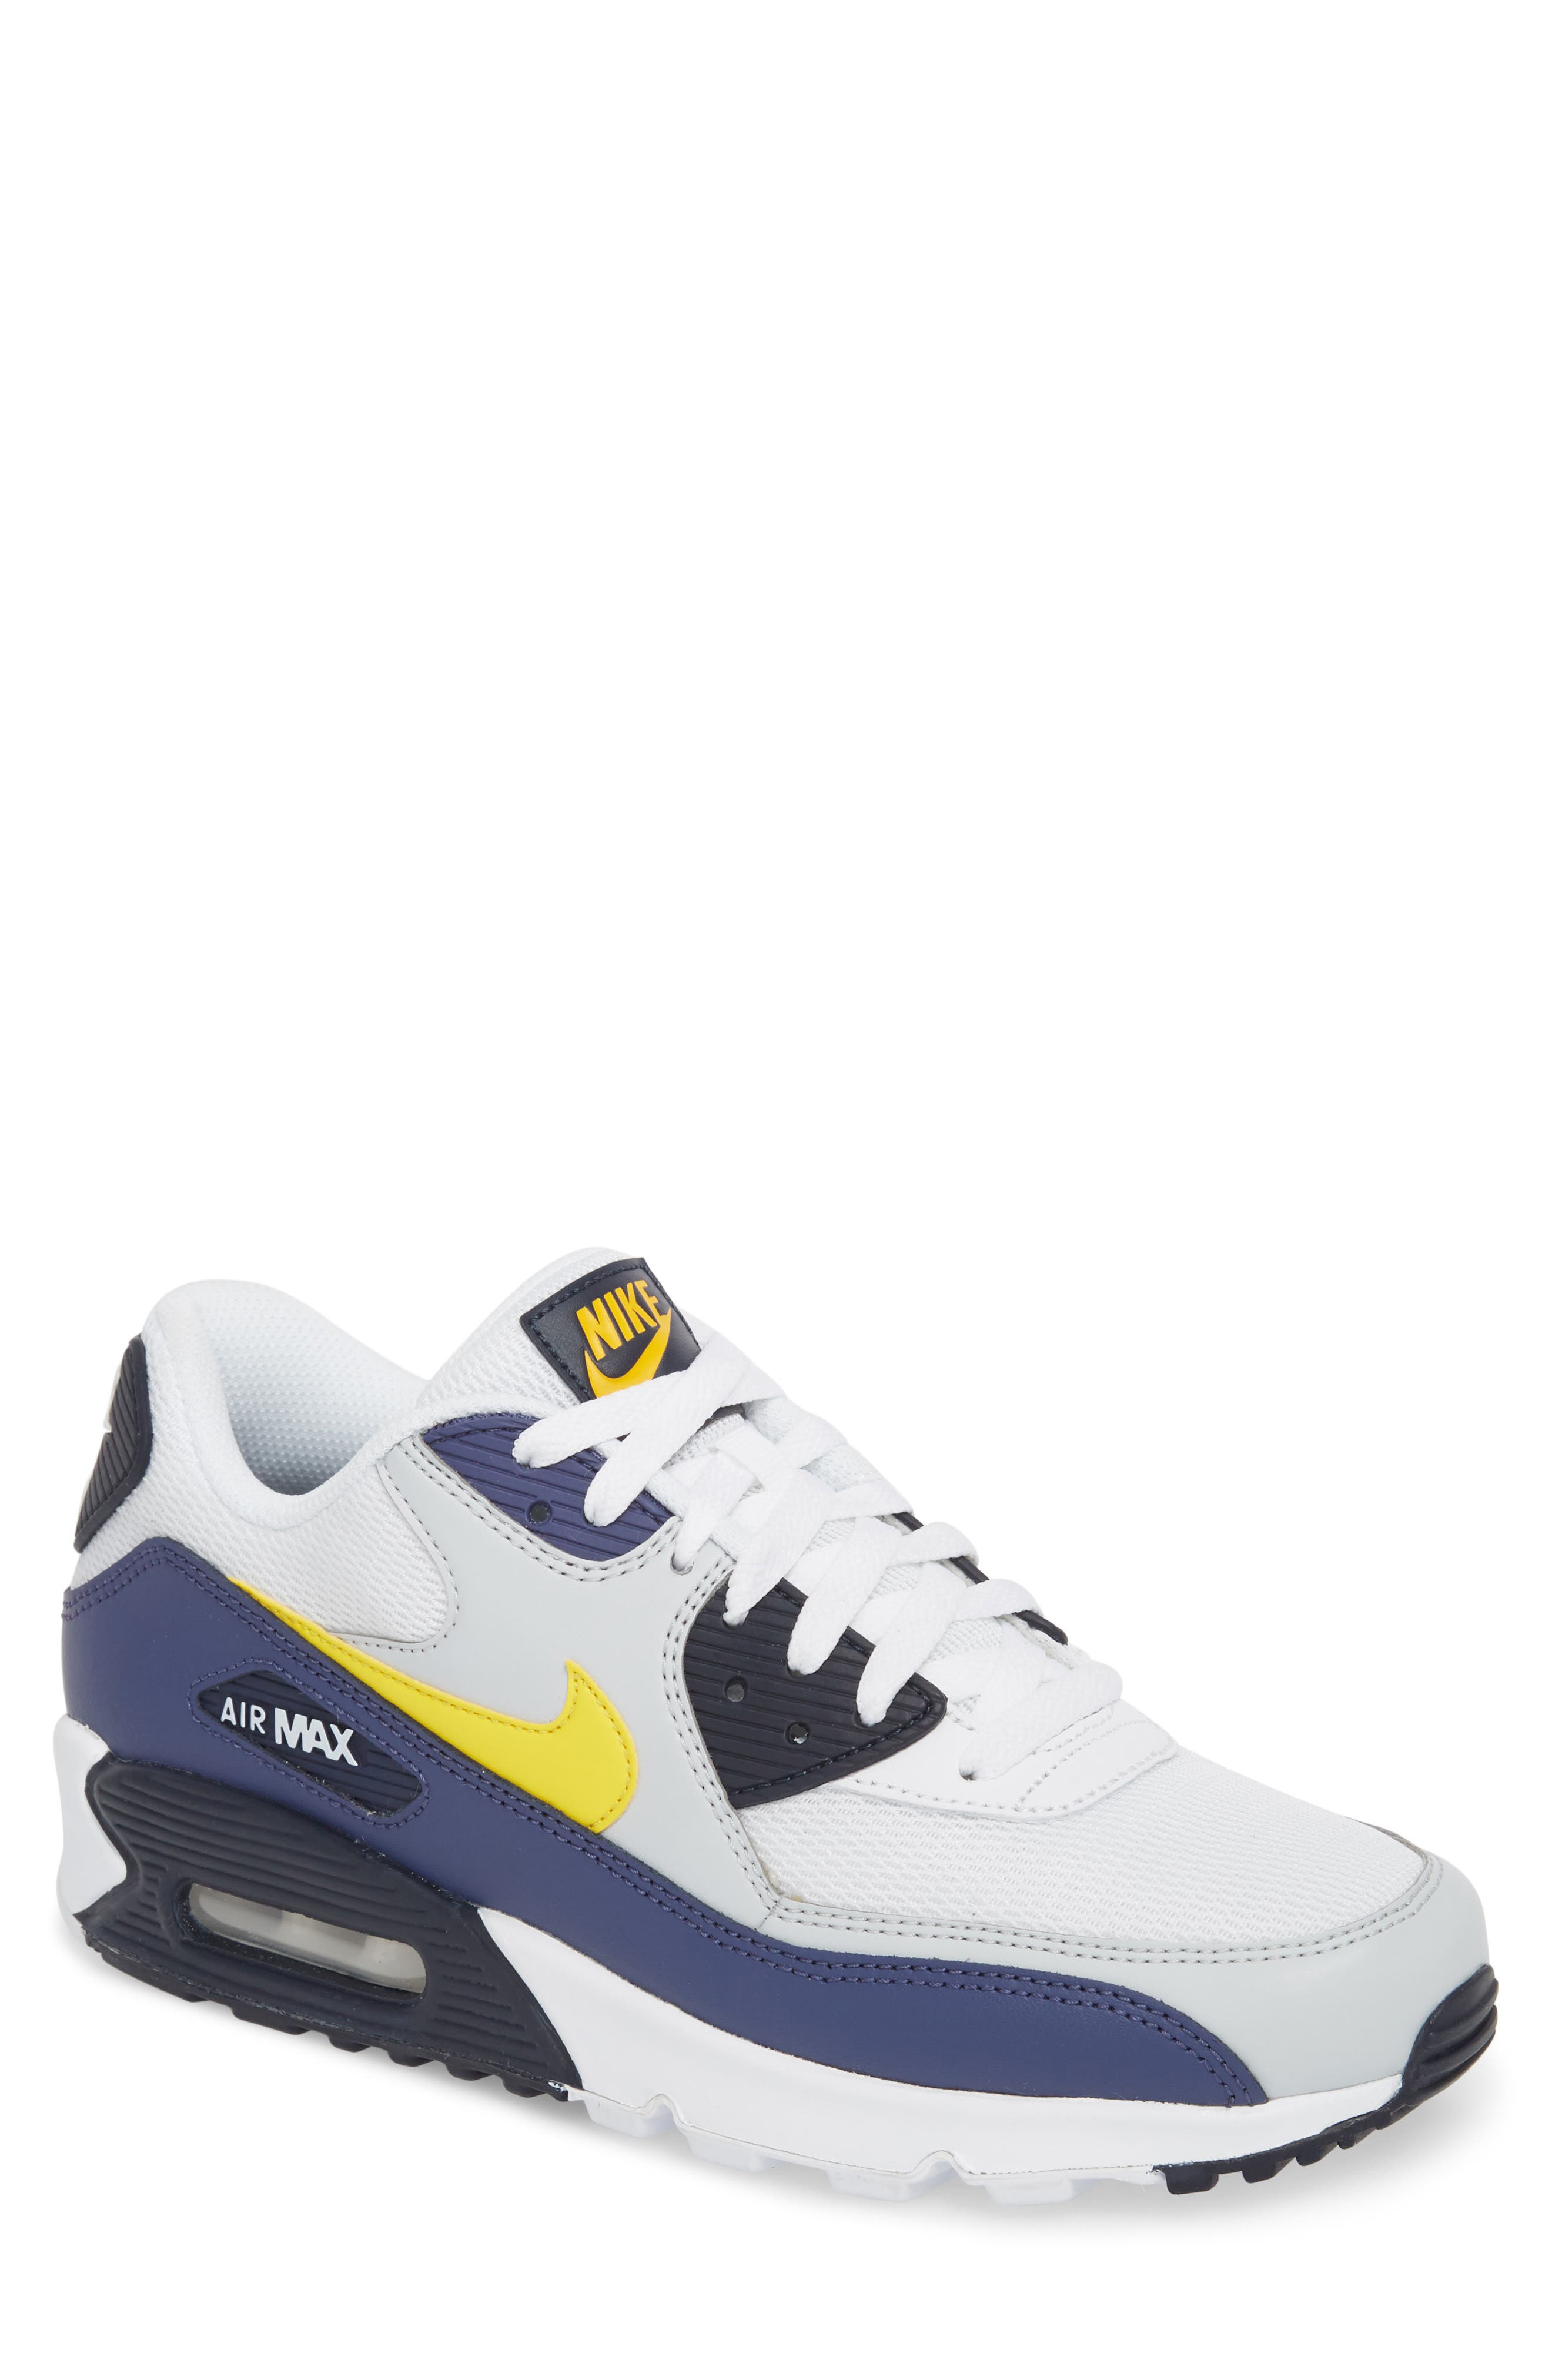 Air Max 90 Essential Sneaker,                             Main thumbnail 1, color,                             White/ Tour Yellow/ Blue